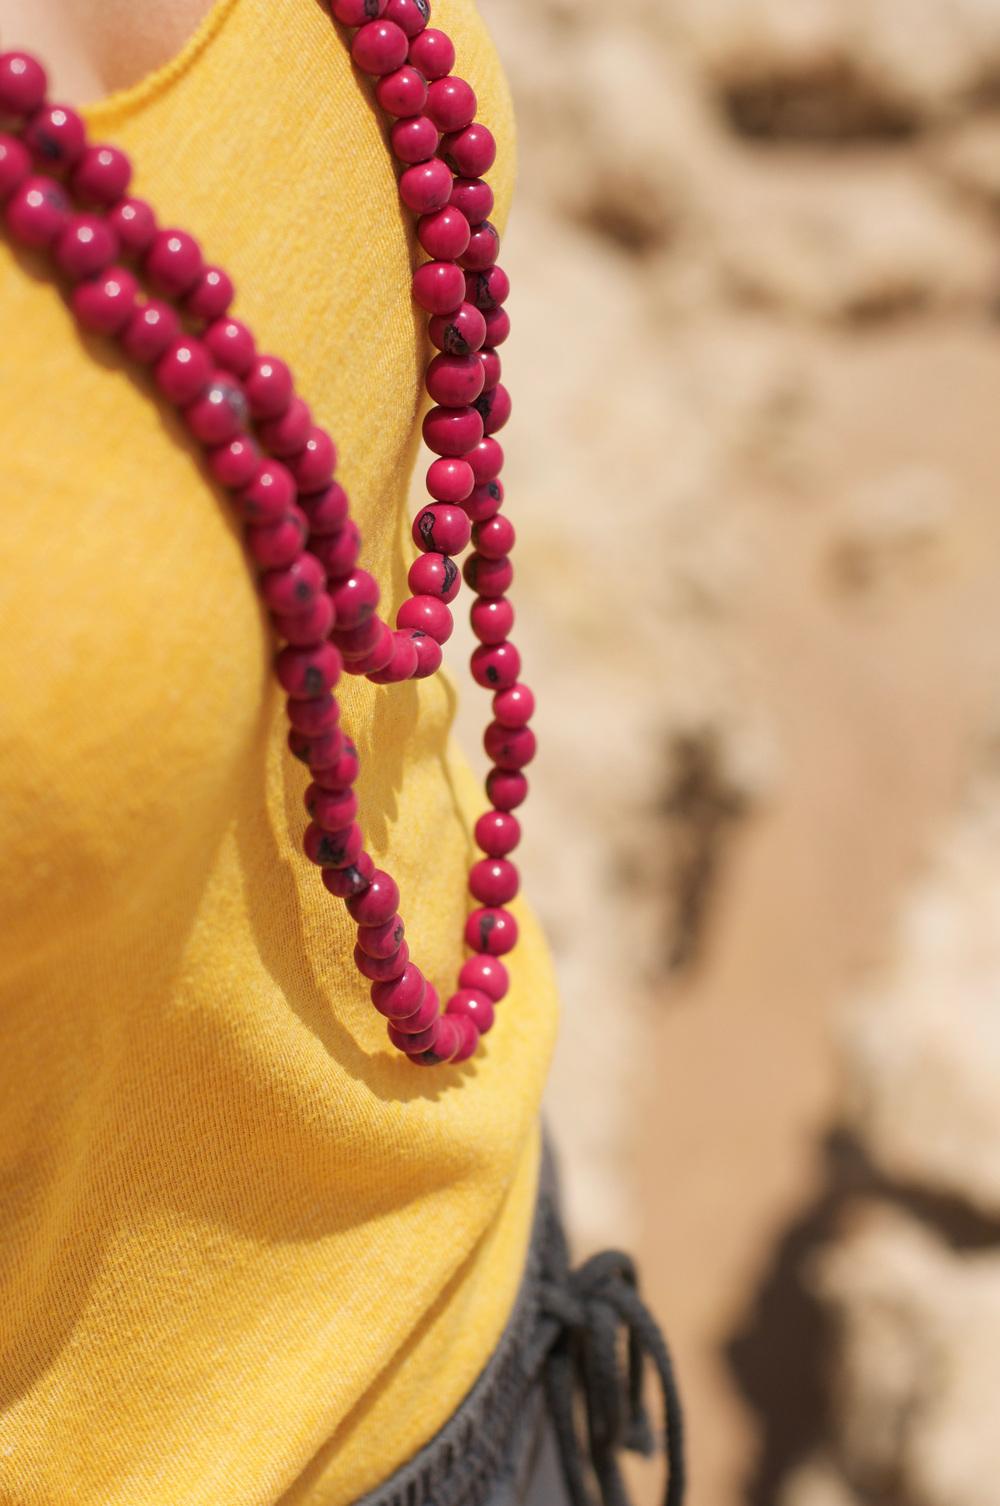 Noonday Acai Pink Beads2.jpg